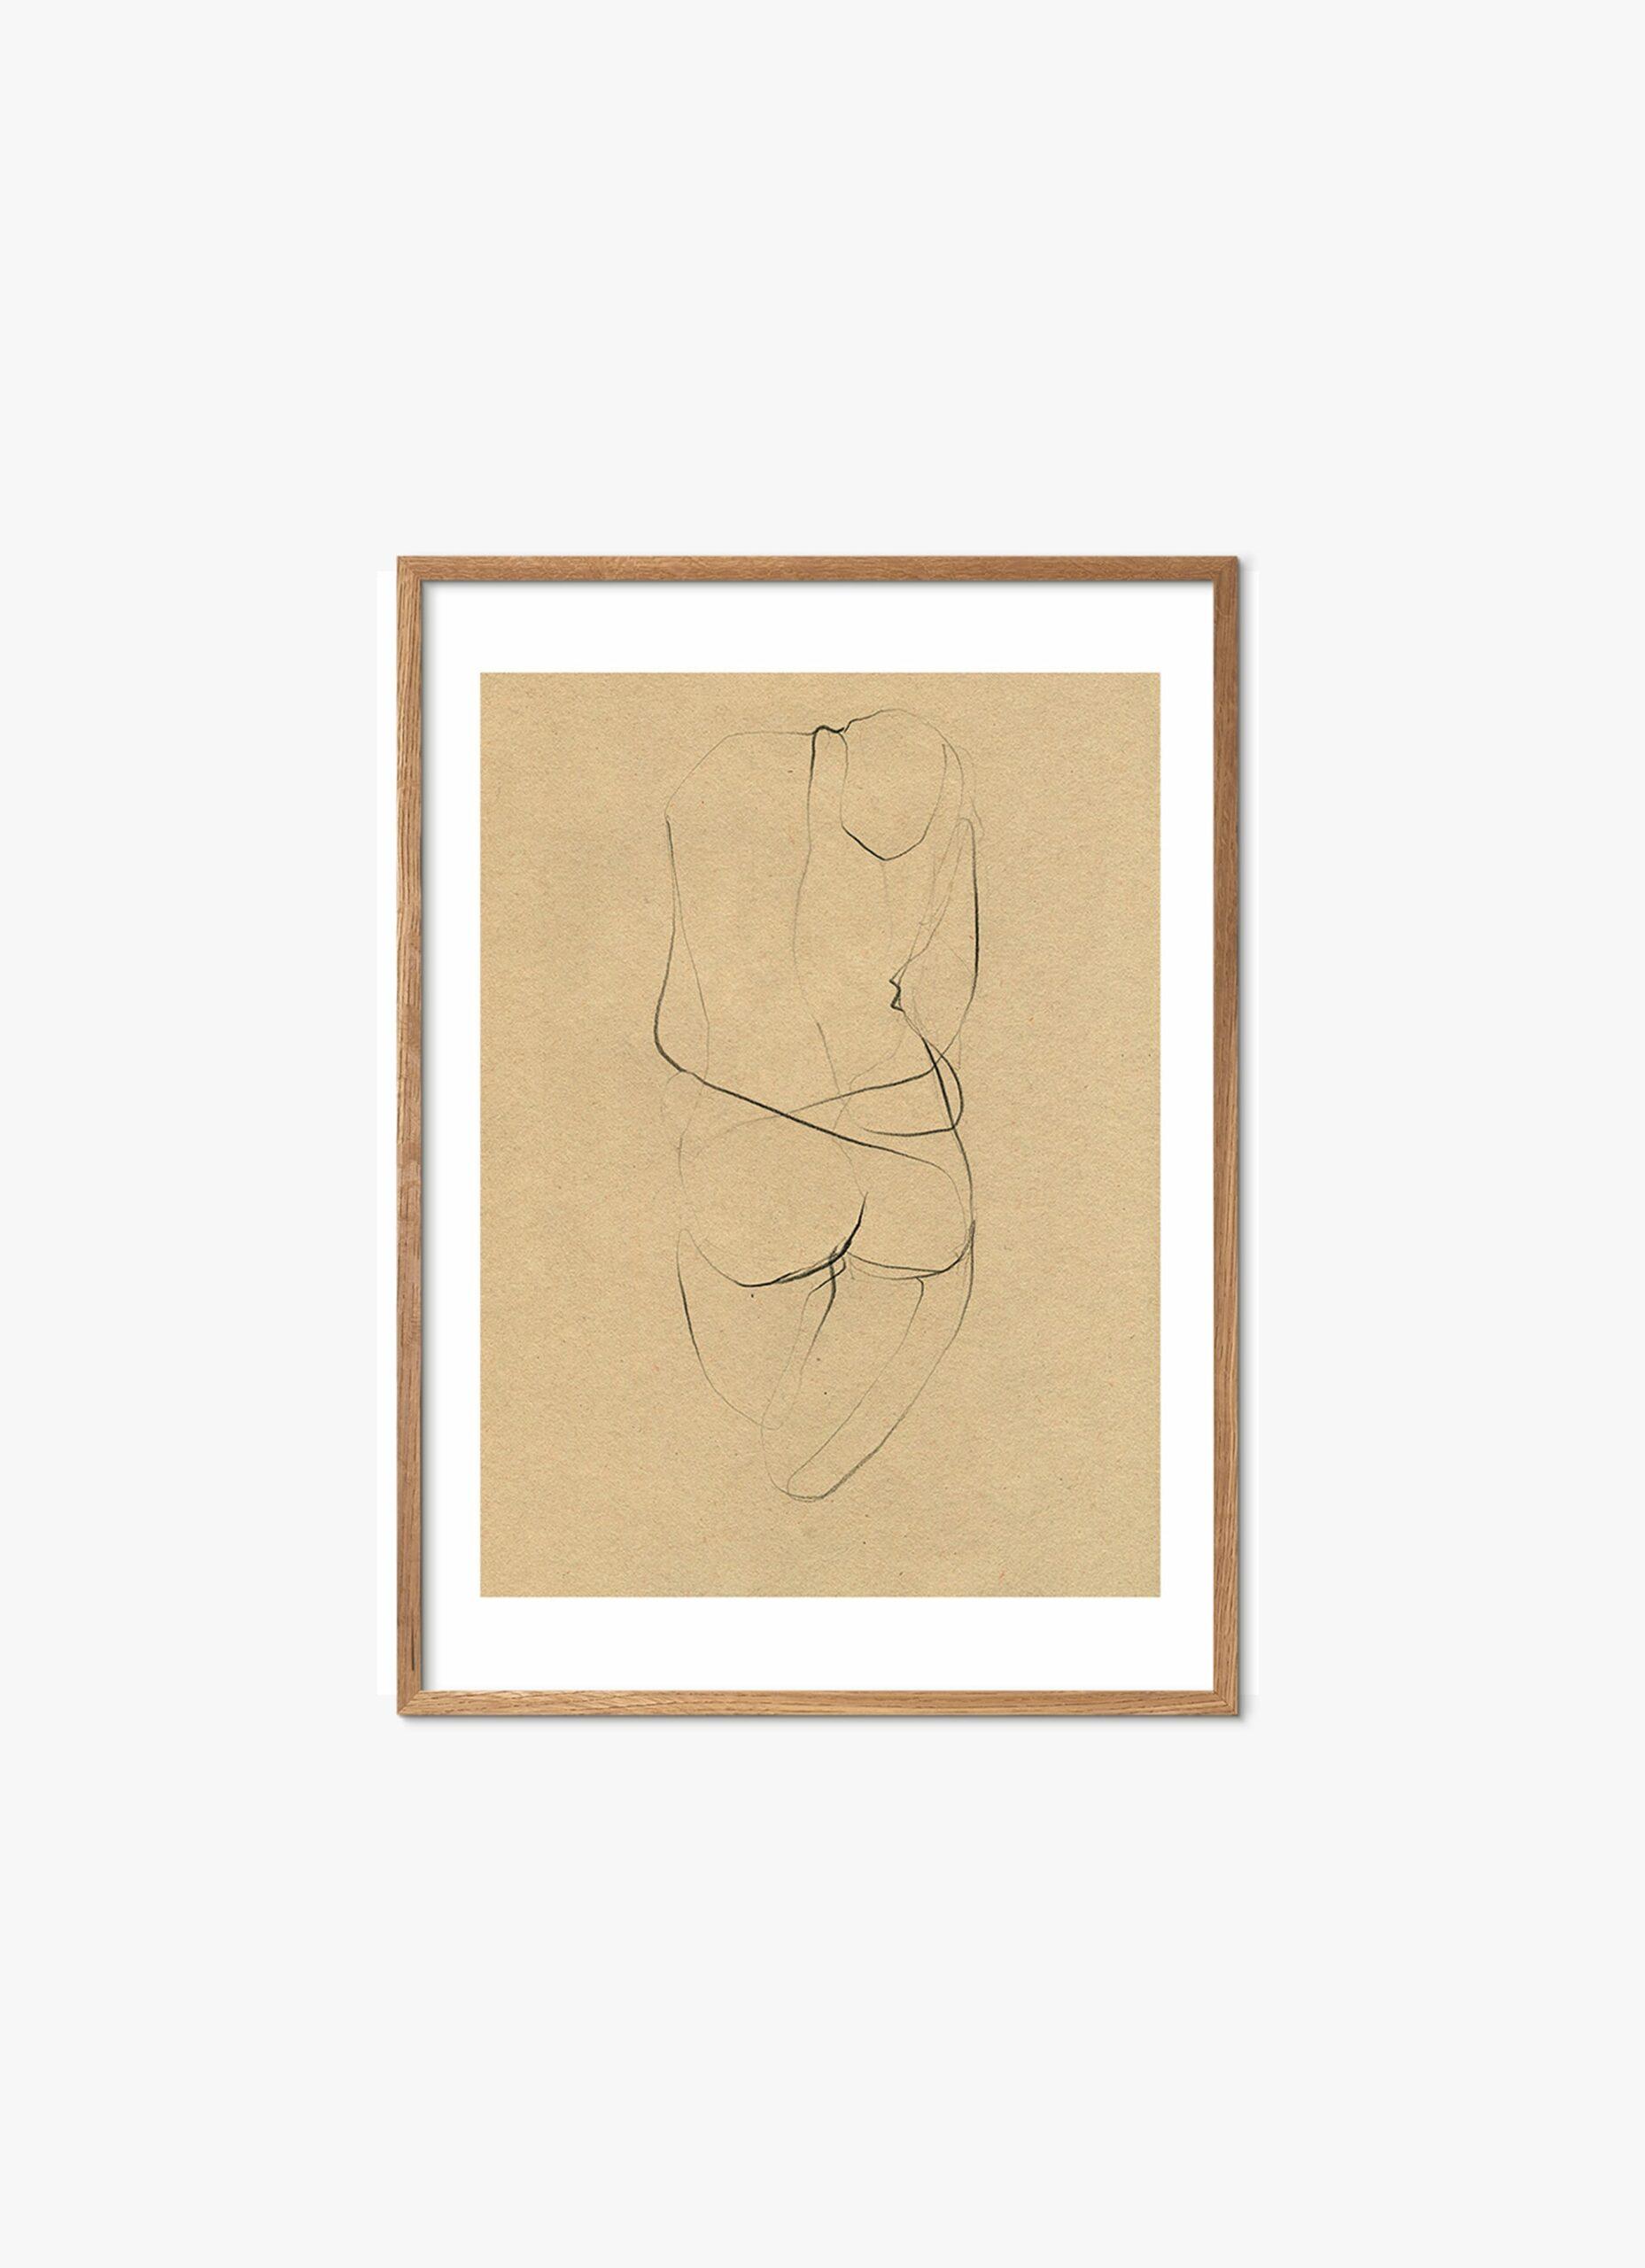 Ekaterina Koroleva - Art Print - Nude 02 - 30x40cm